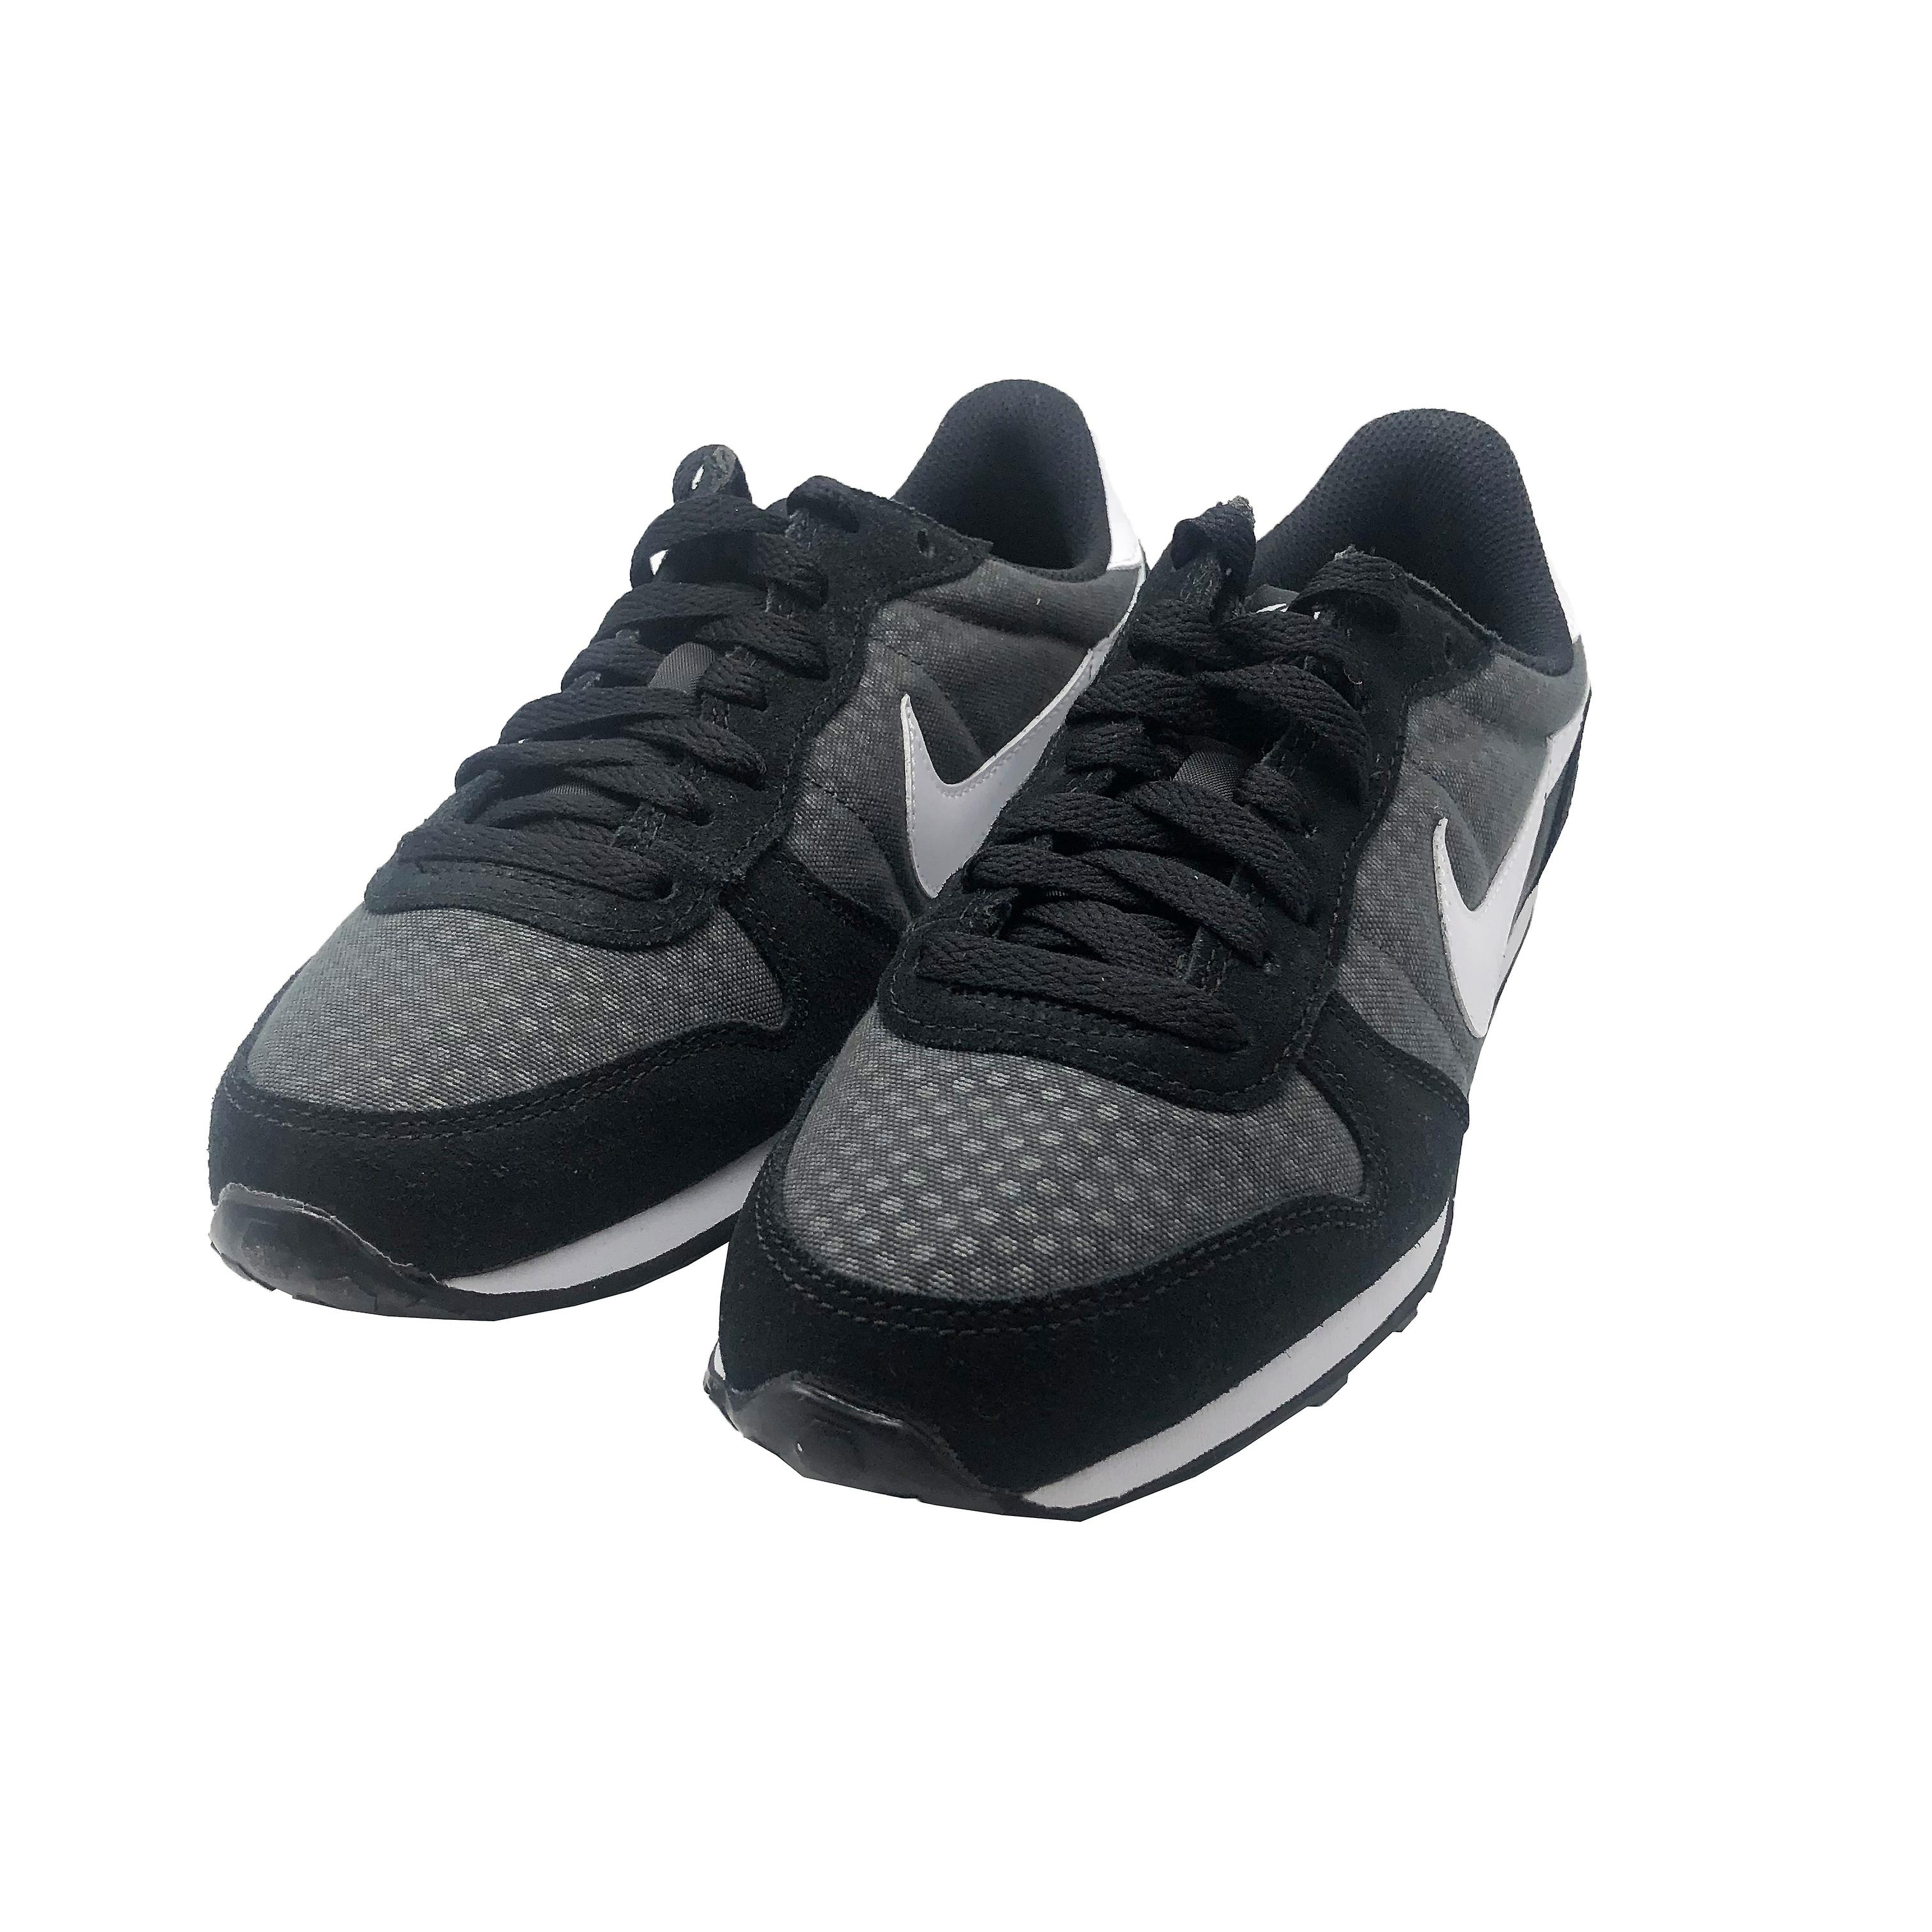 Nike Genicco 644451 012 Damen Trainer